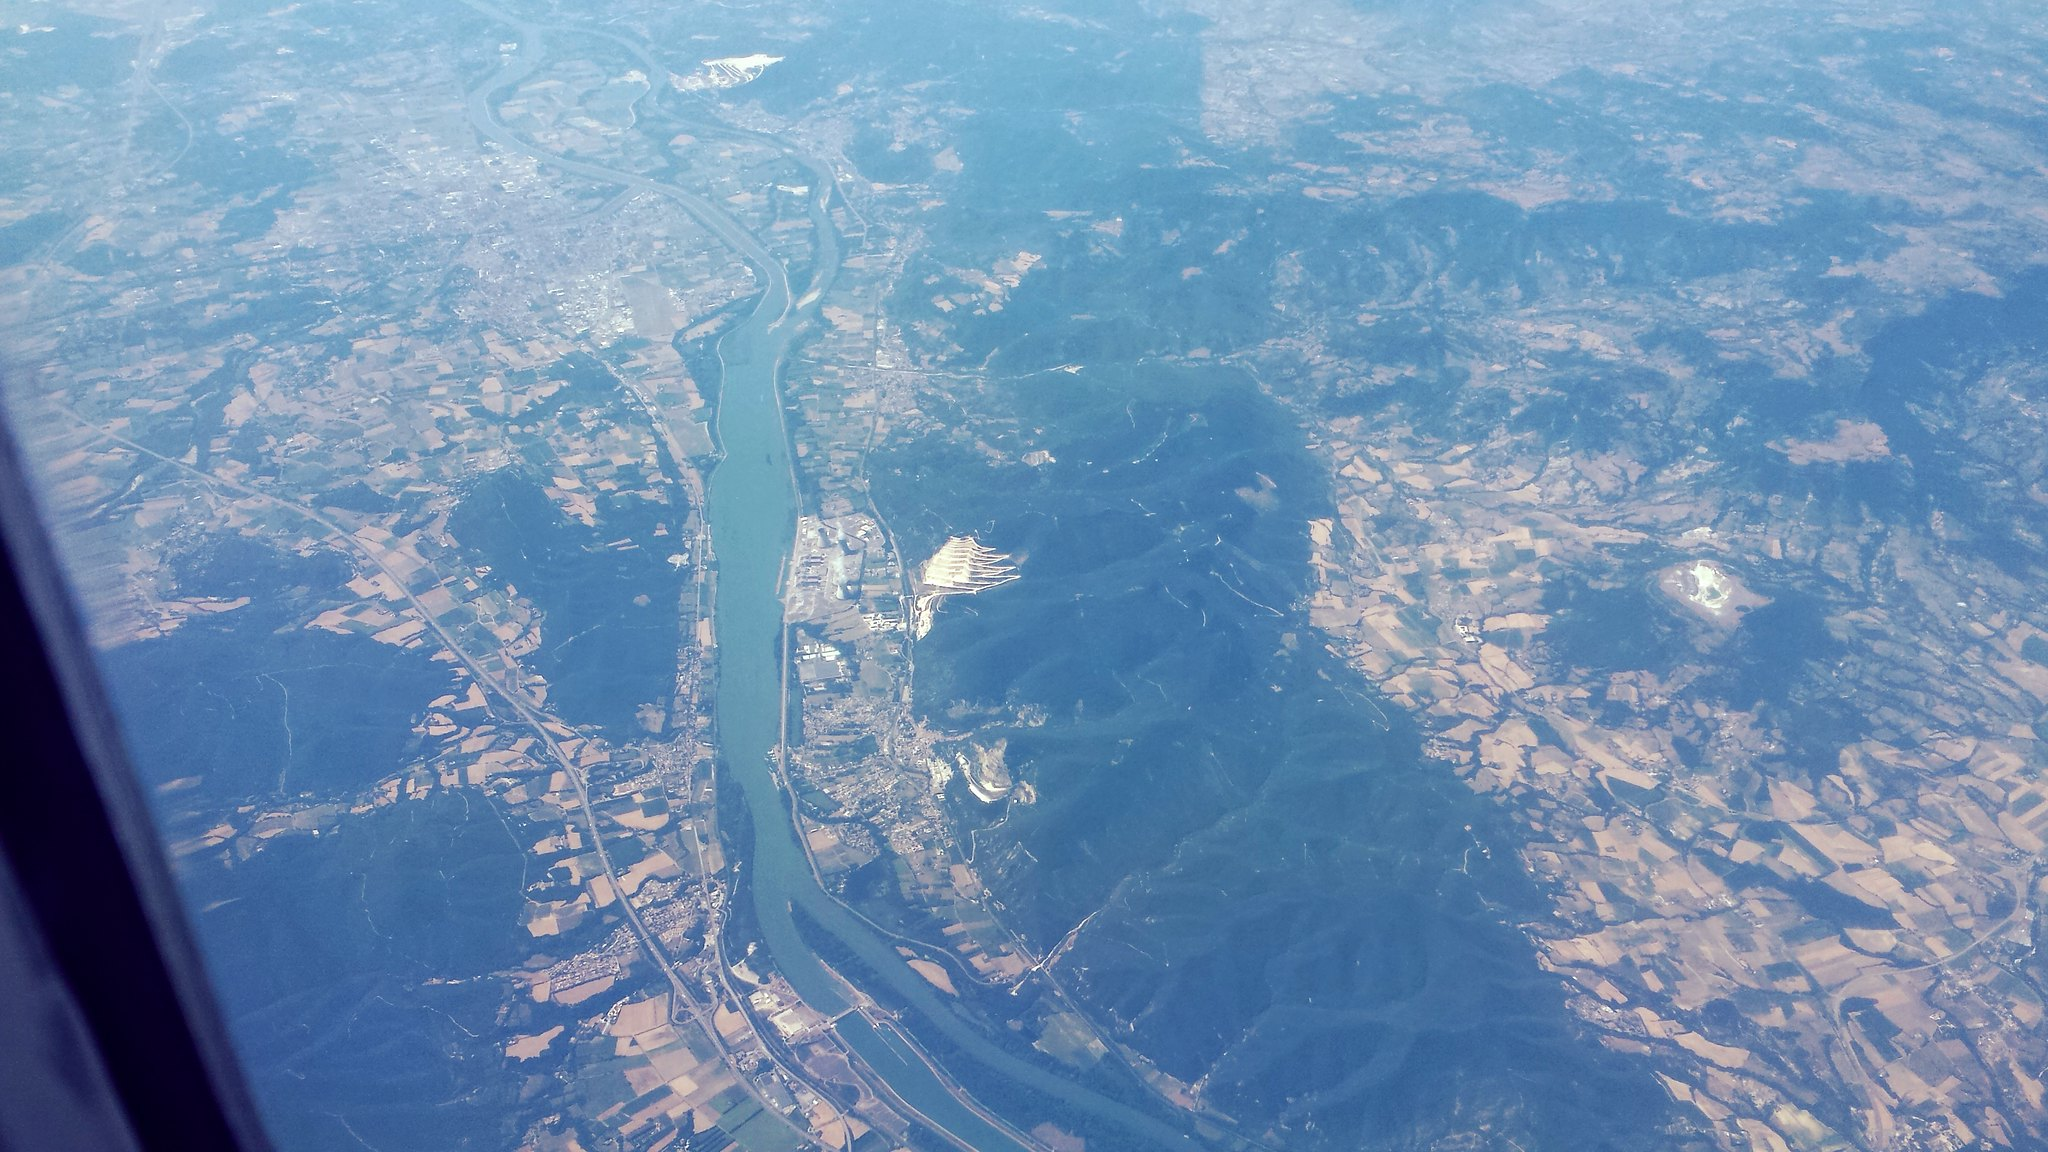 Avis du vol air transat montreal marseille en premium eco - Piscine municipale montreal marseille ...